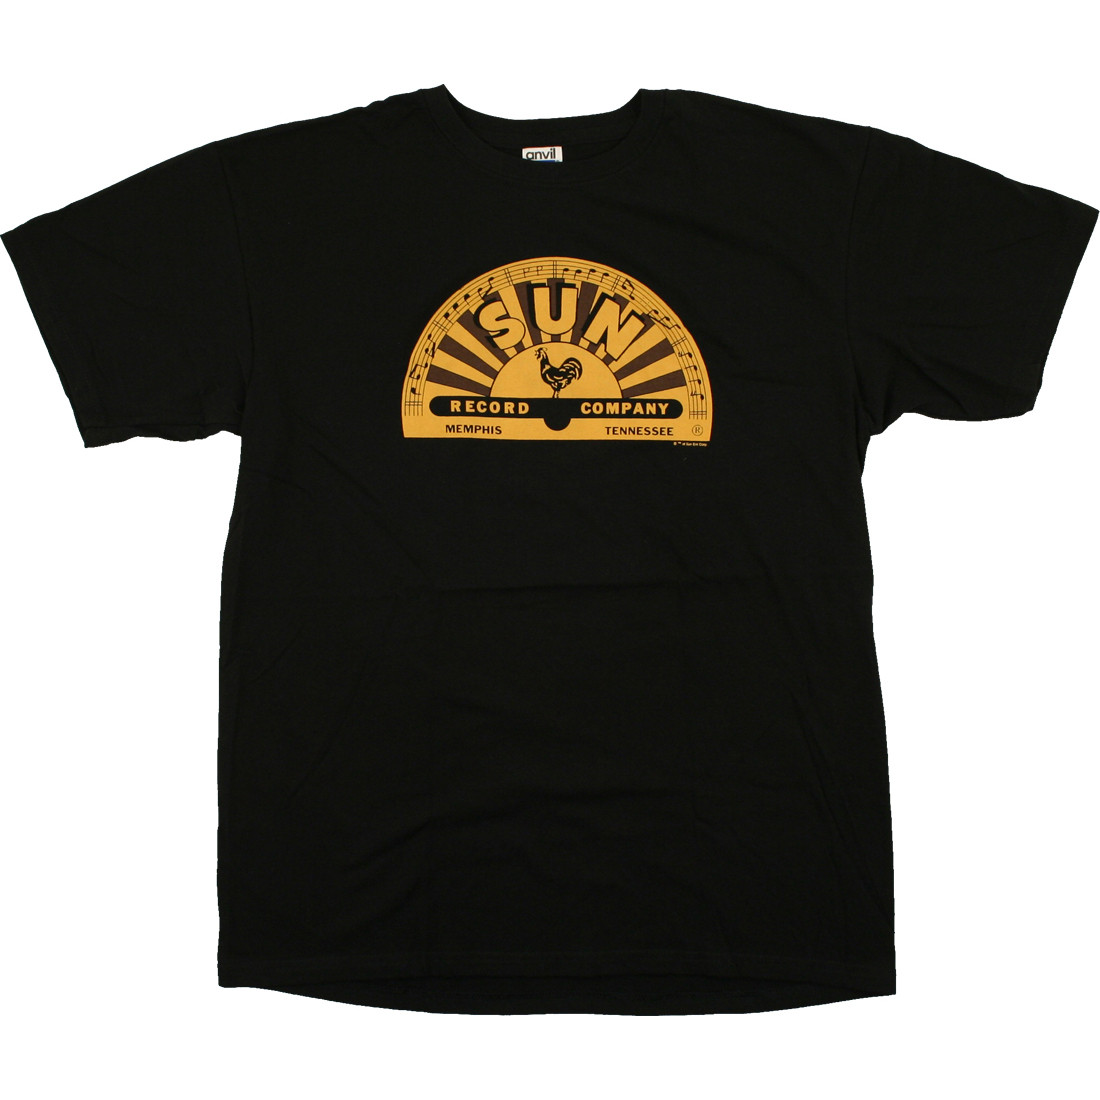 Sun Records Memphis Label Black T-Shirt